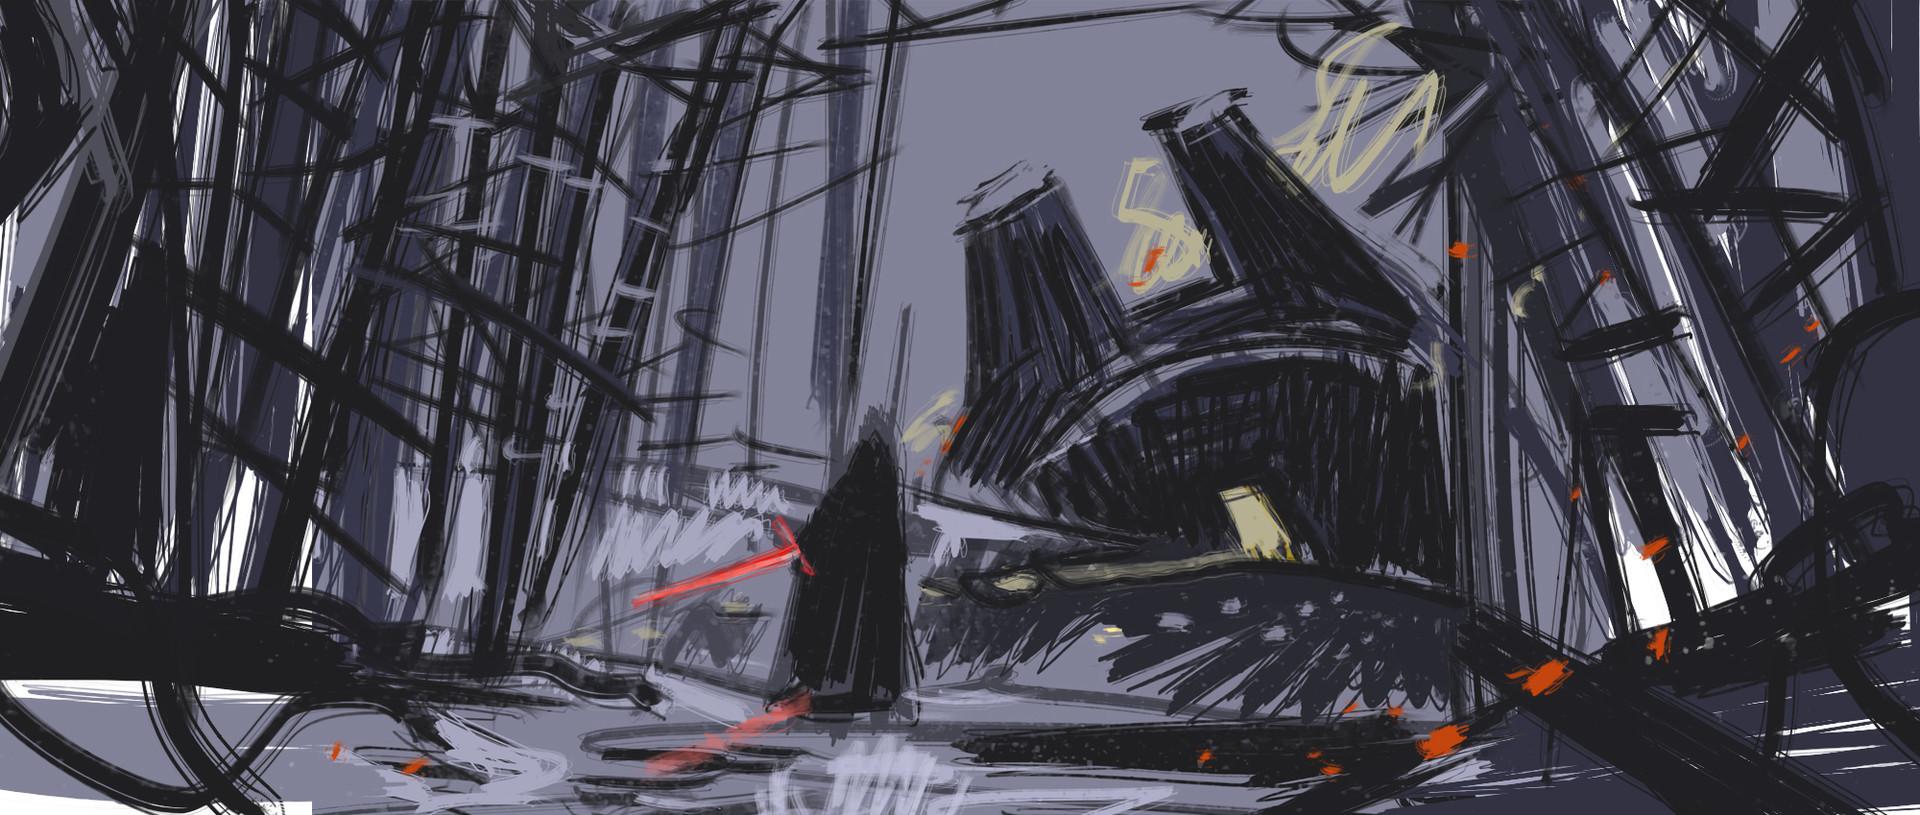 Daniele afferni daniele afferni asc daniele afferni asc starwars7 conceptart pencil